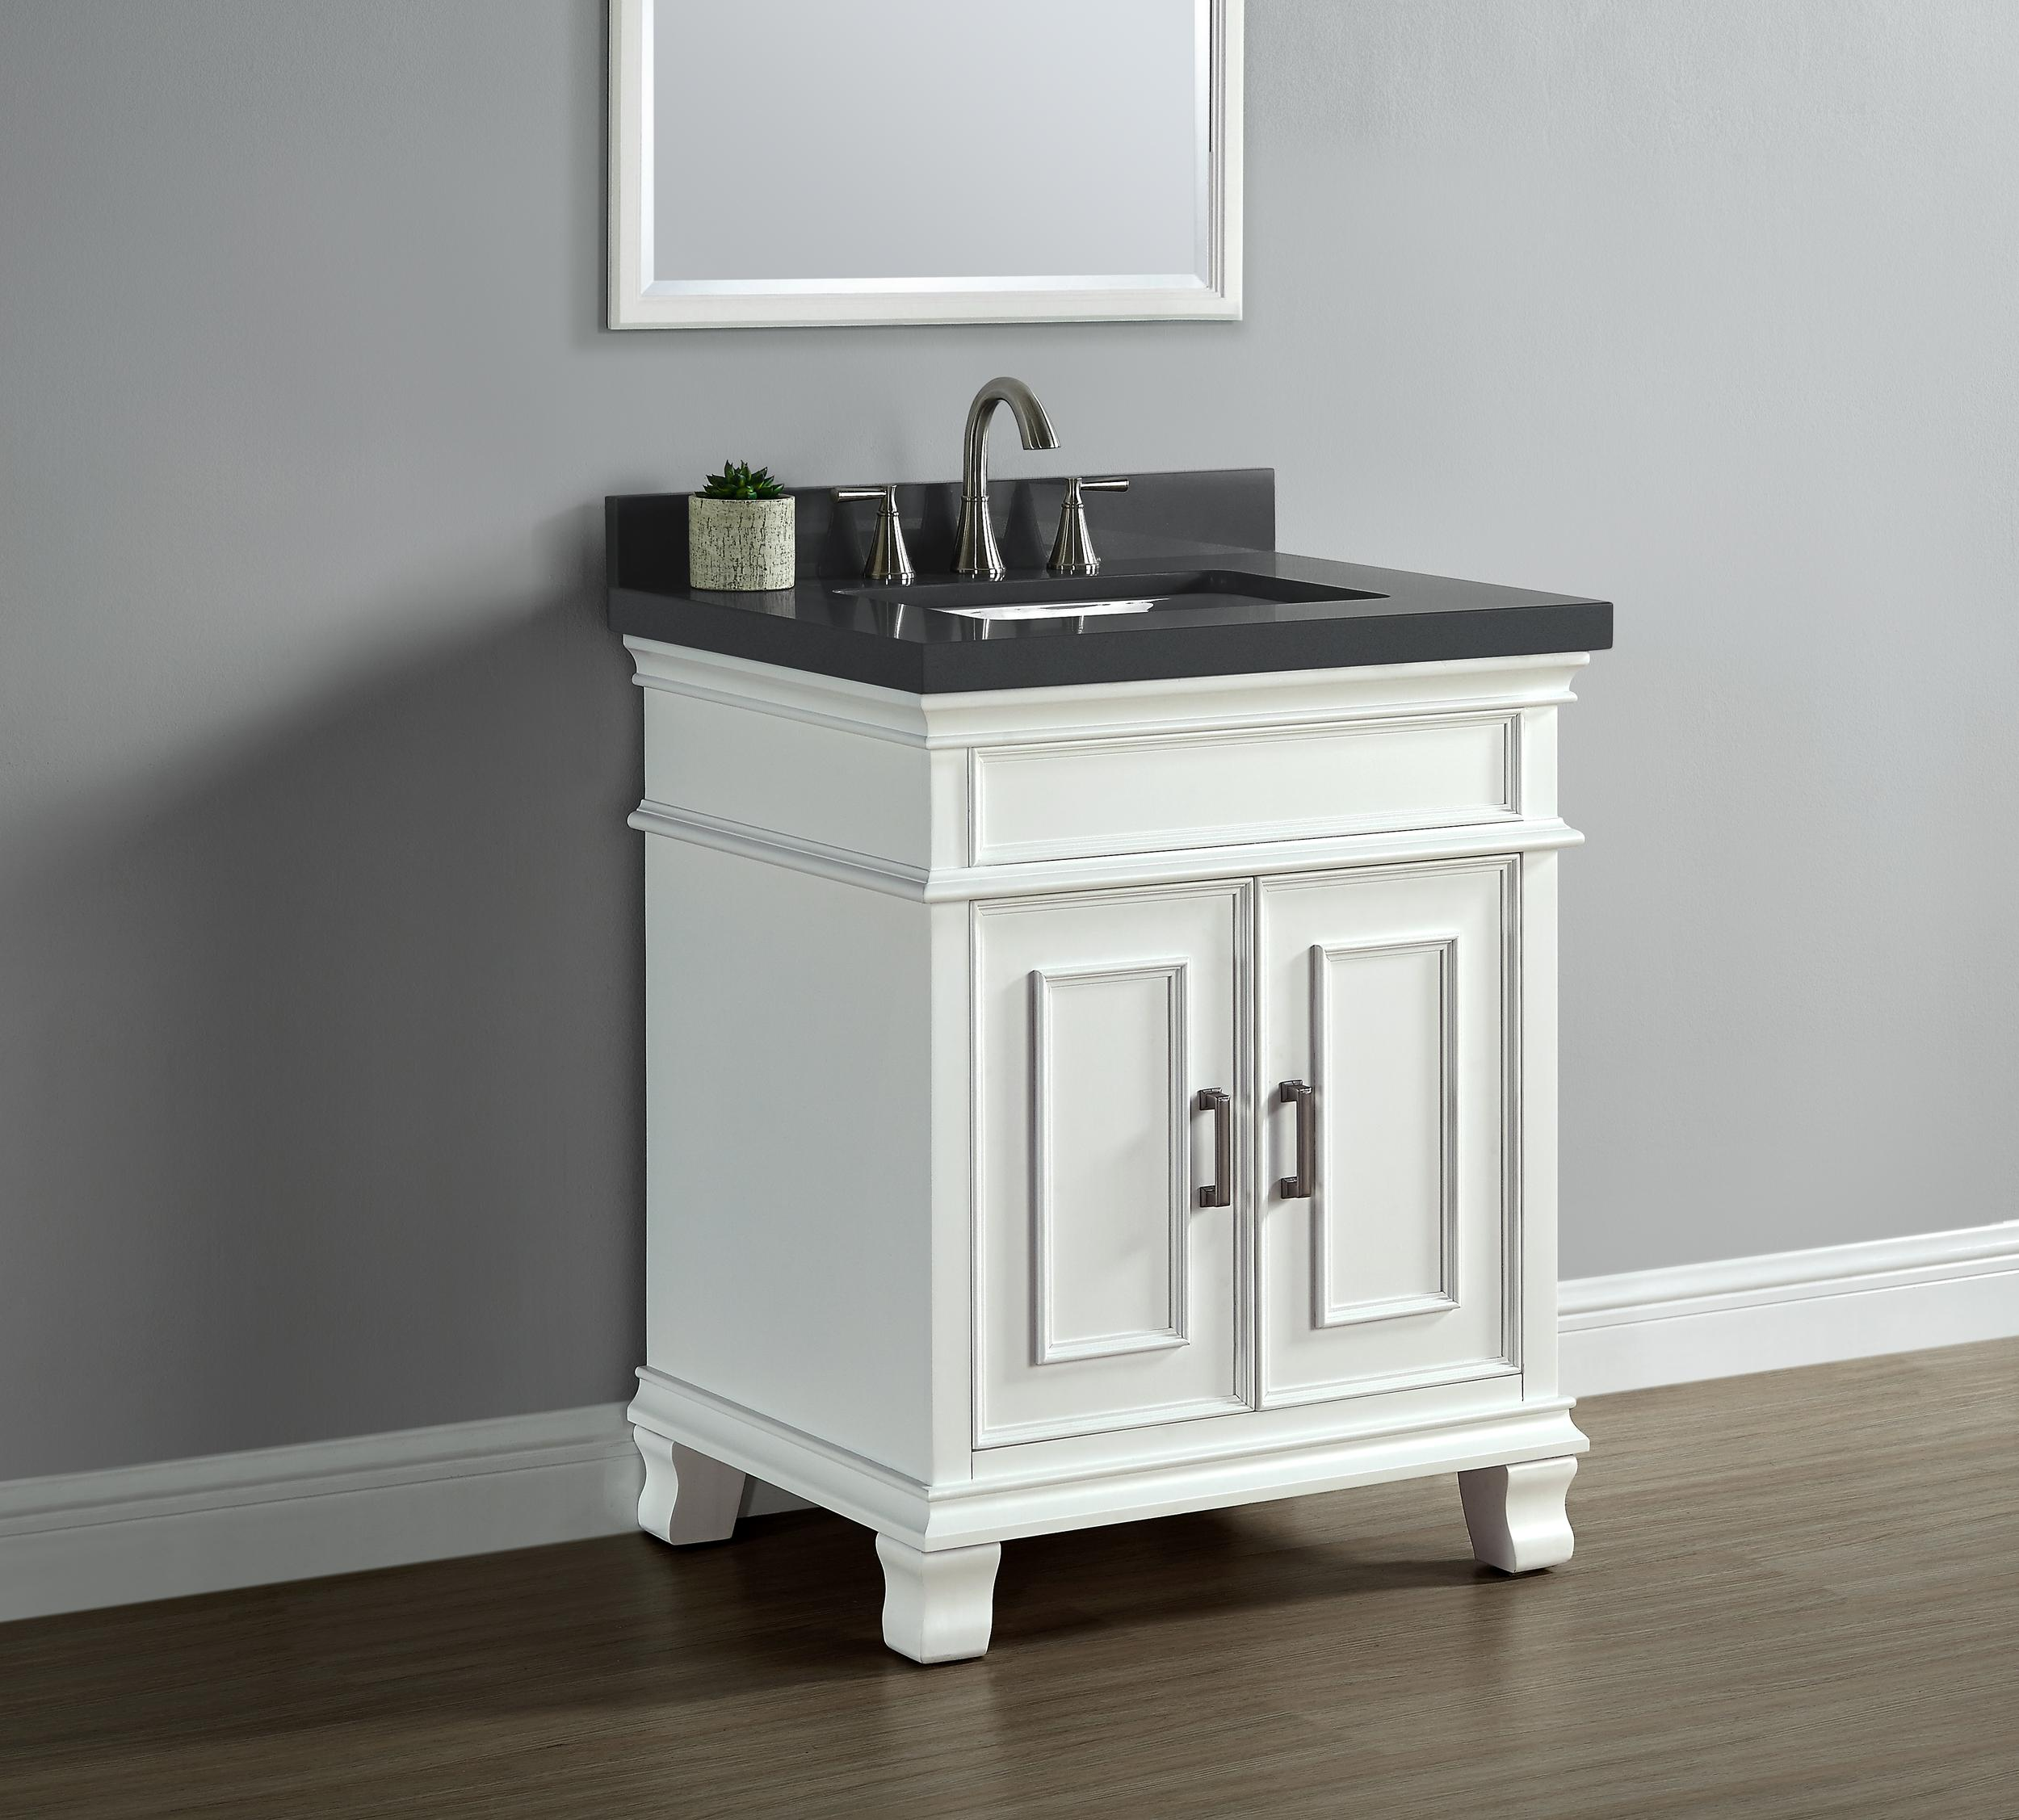 Mission hills 28 single sink middleton vanity for 2 inch quartz countertop